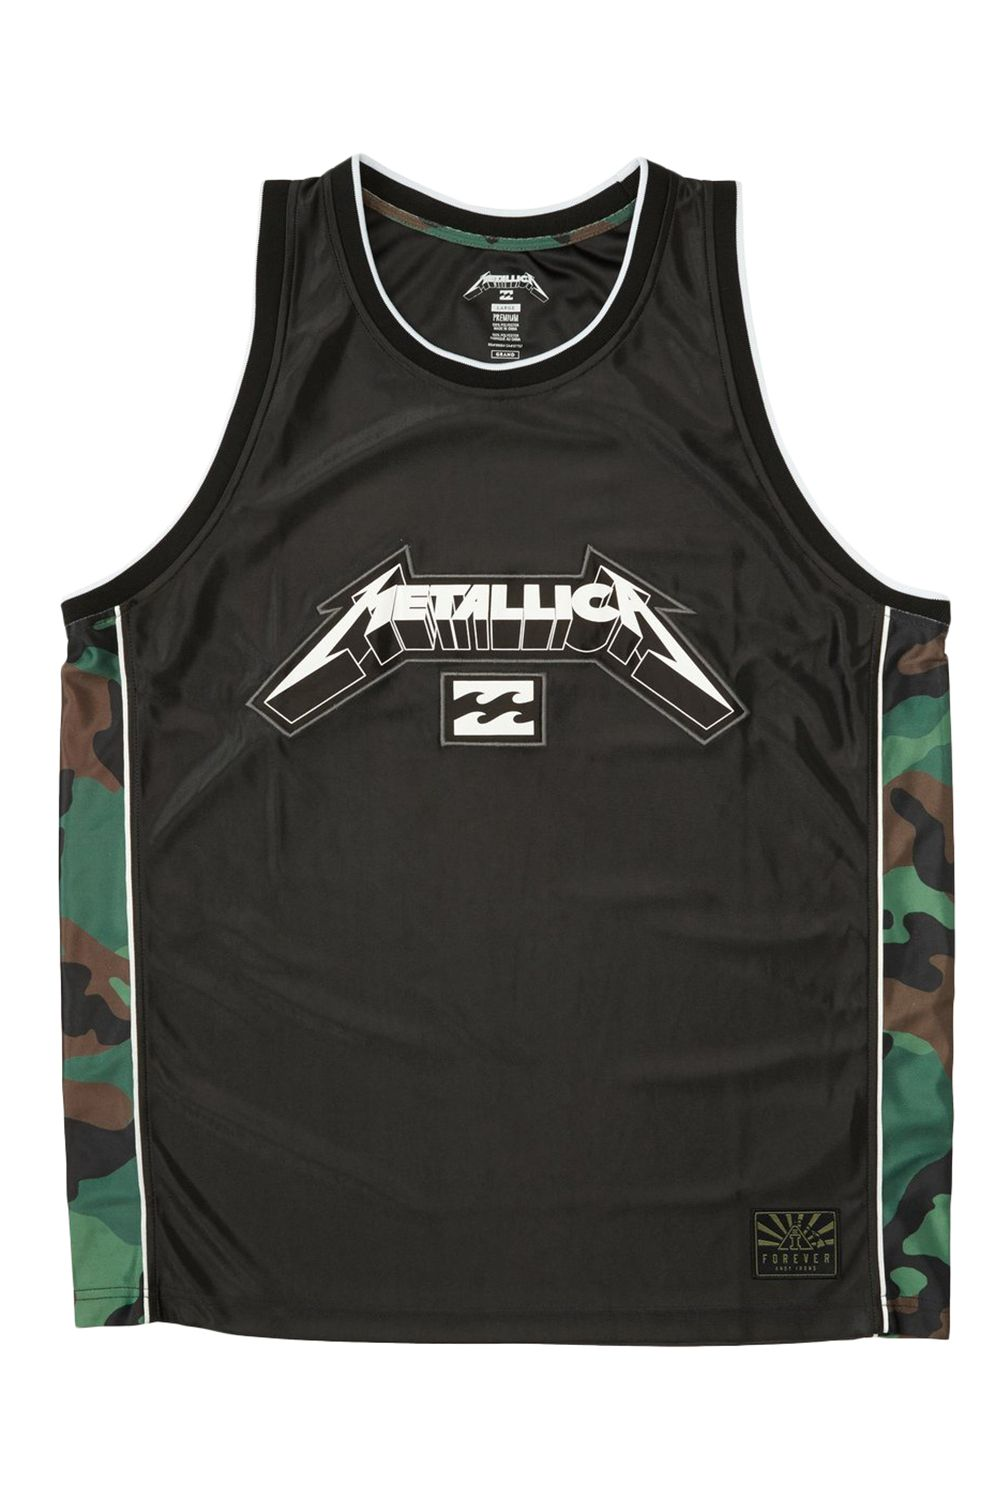 Billabong T-Shirt Tank Top METALLICA AI Black